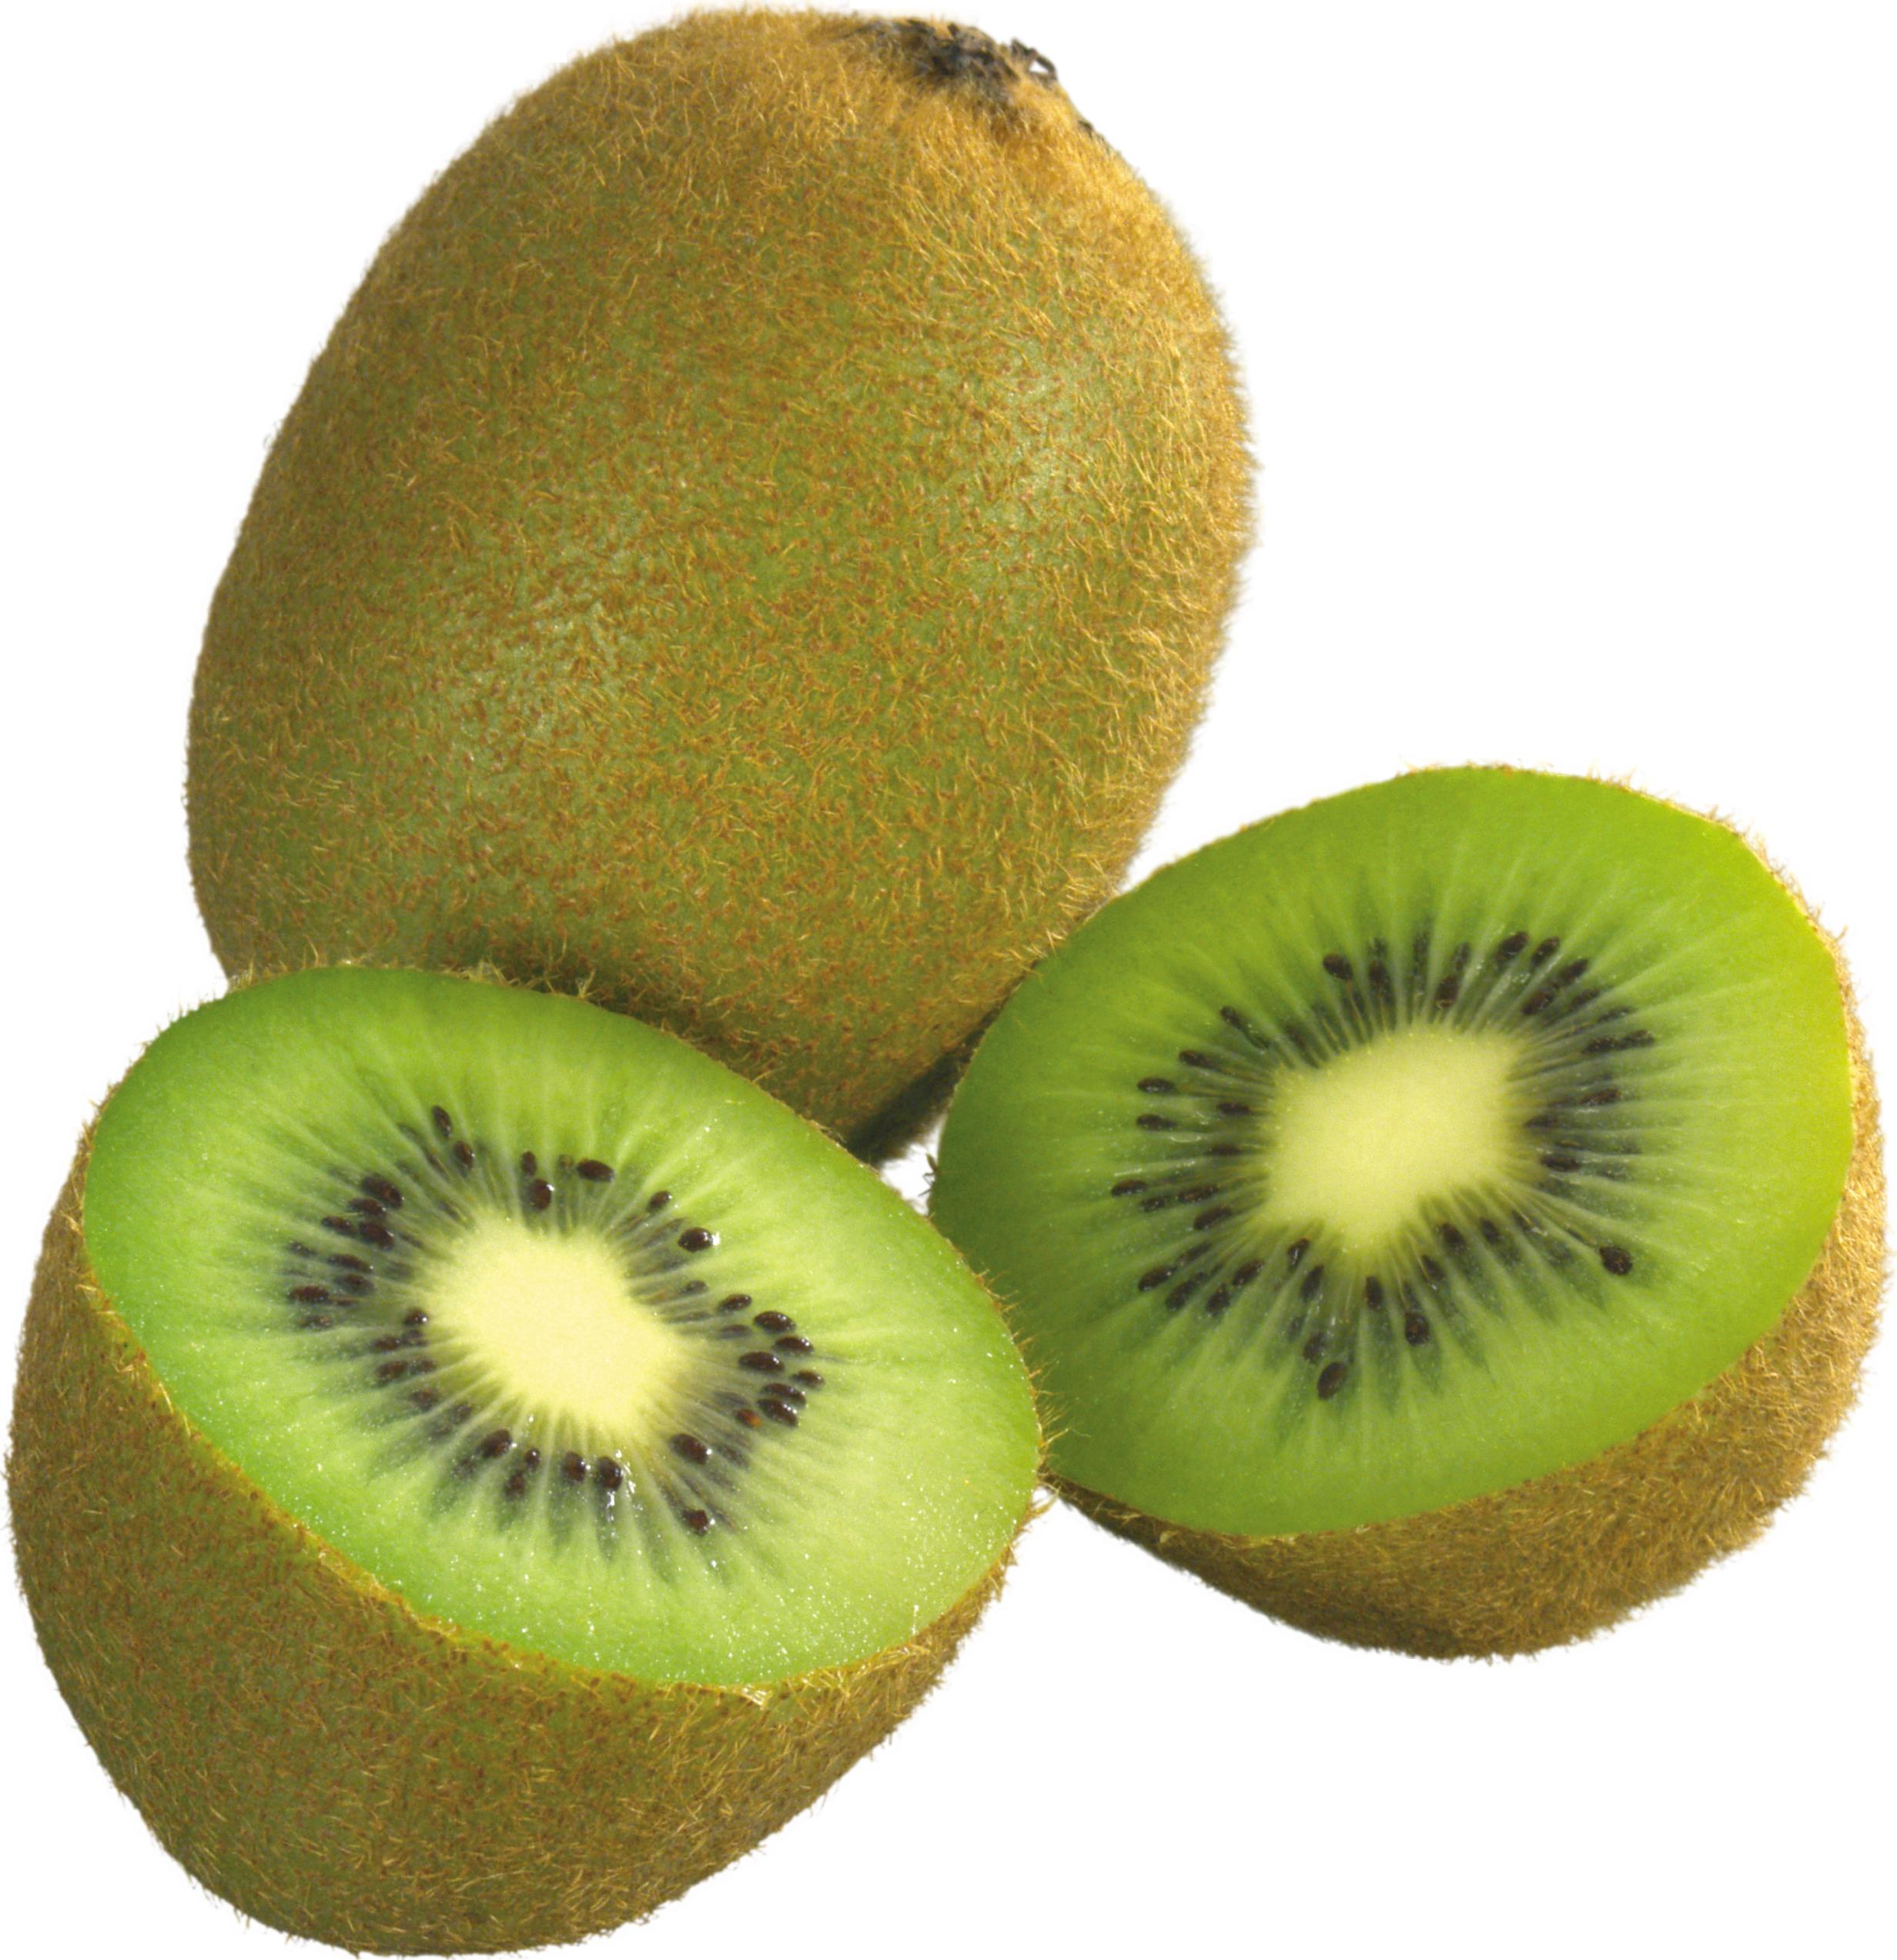 Kiwi PNG Image